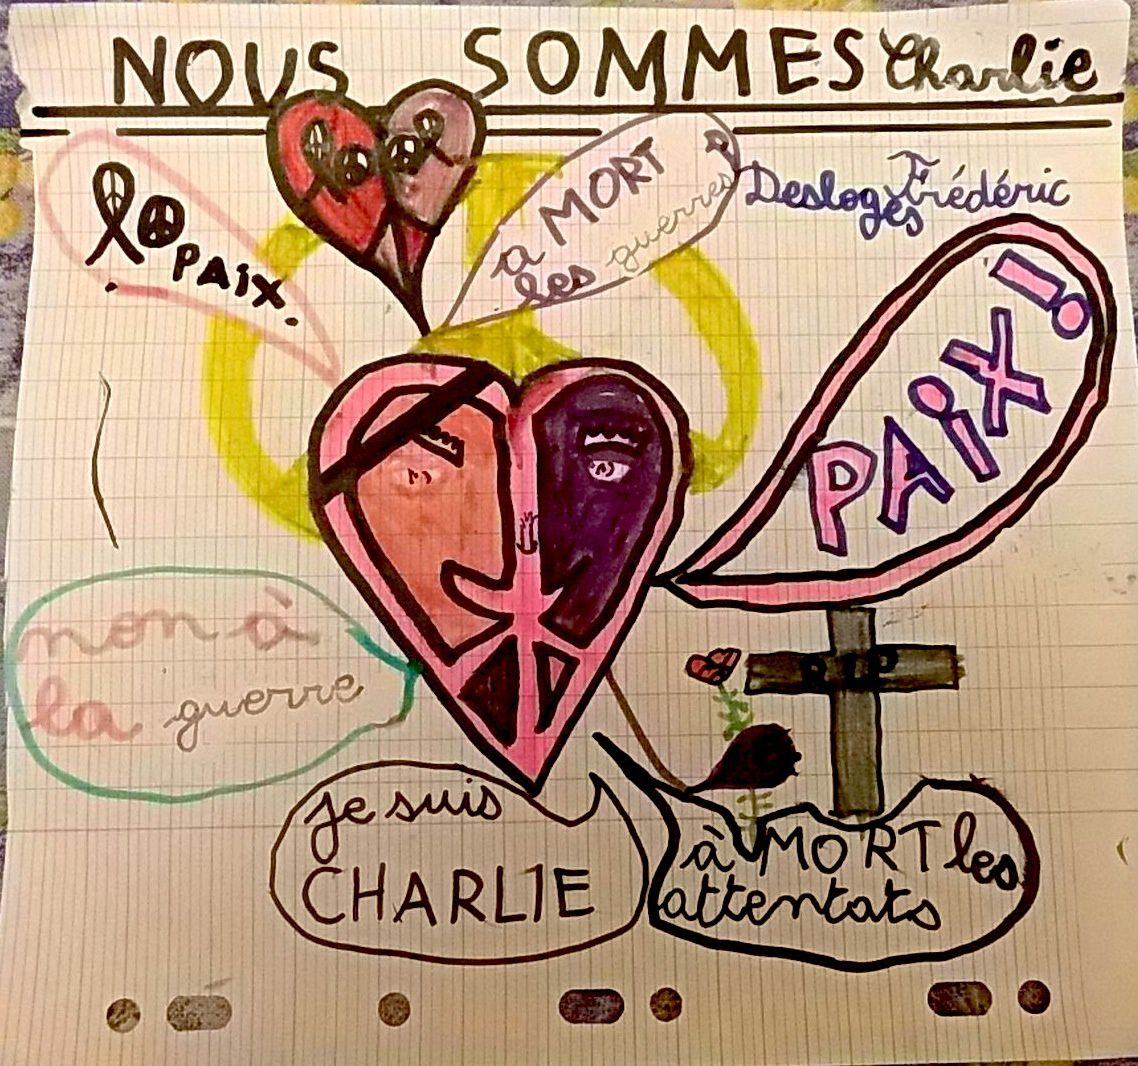 DESSIN de Frédéric en hommage à Charlie Hebdo